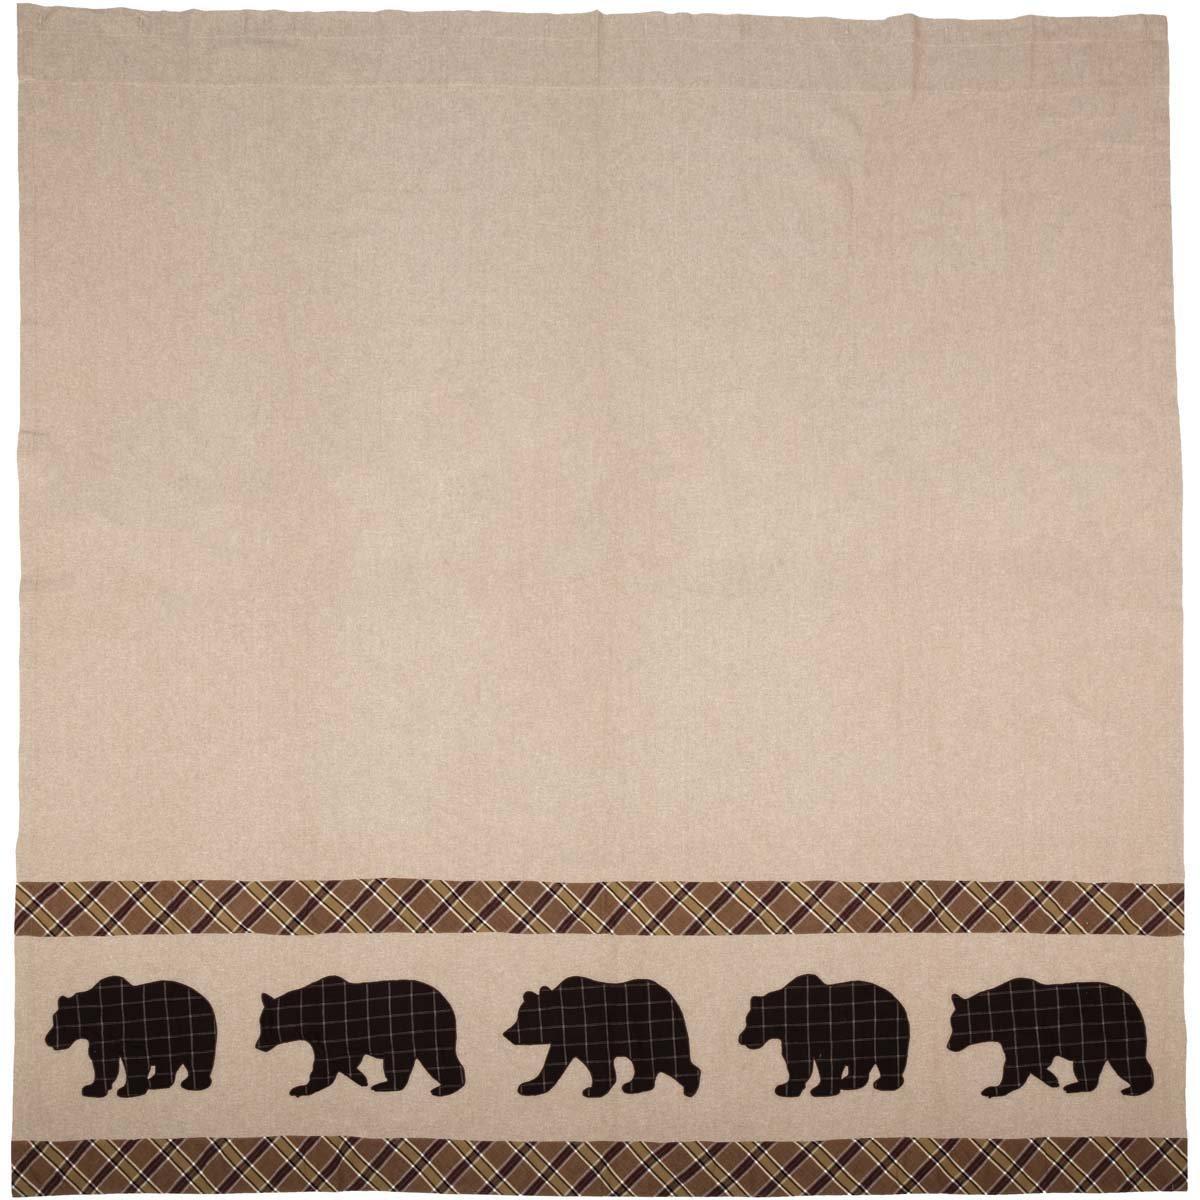 VHC Brands Rustic & Lodge Bath - Wyatt Tan Bear Shower Curtain,